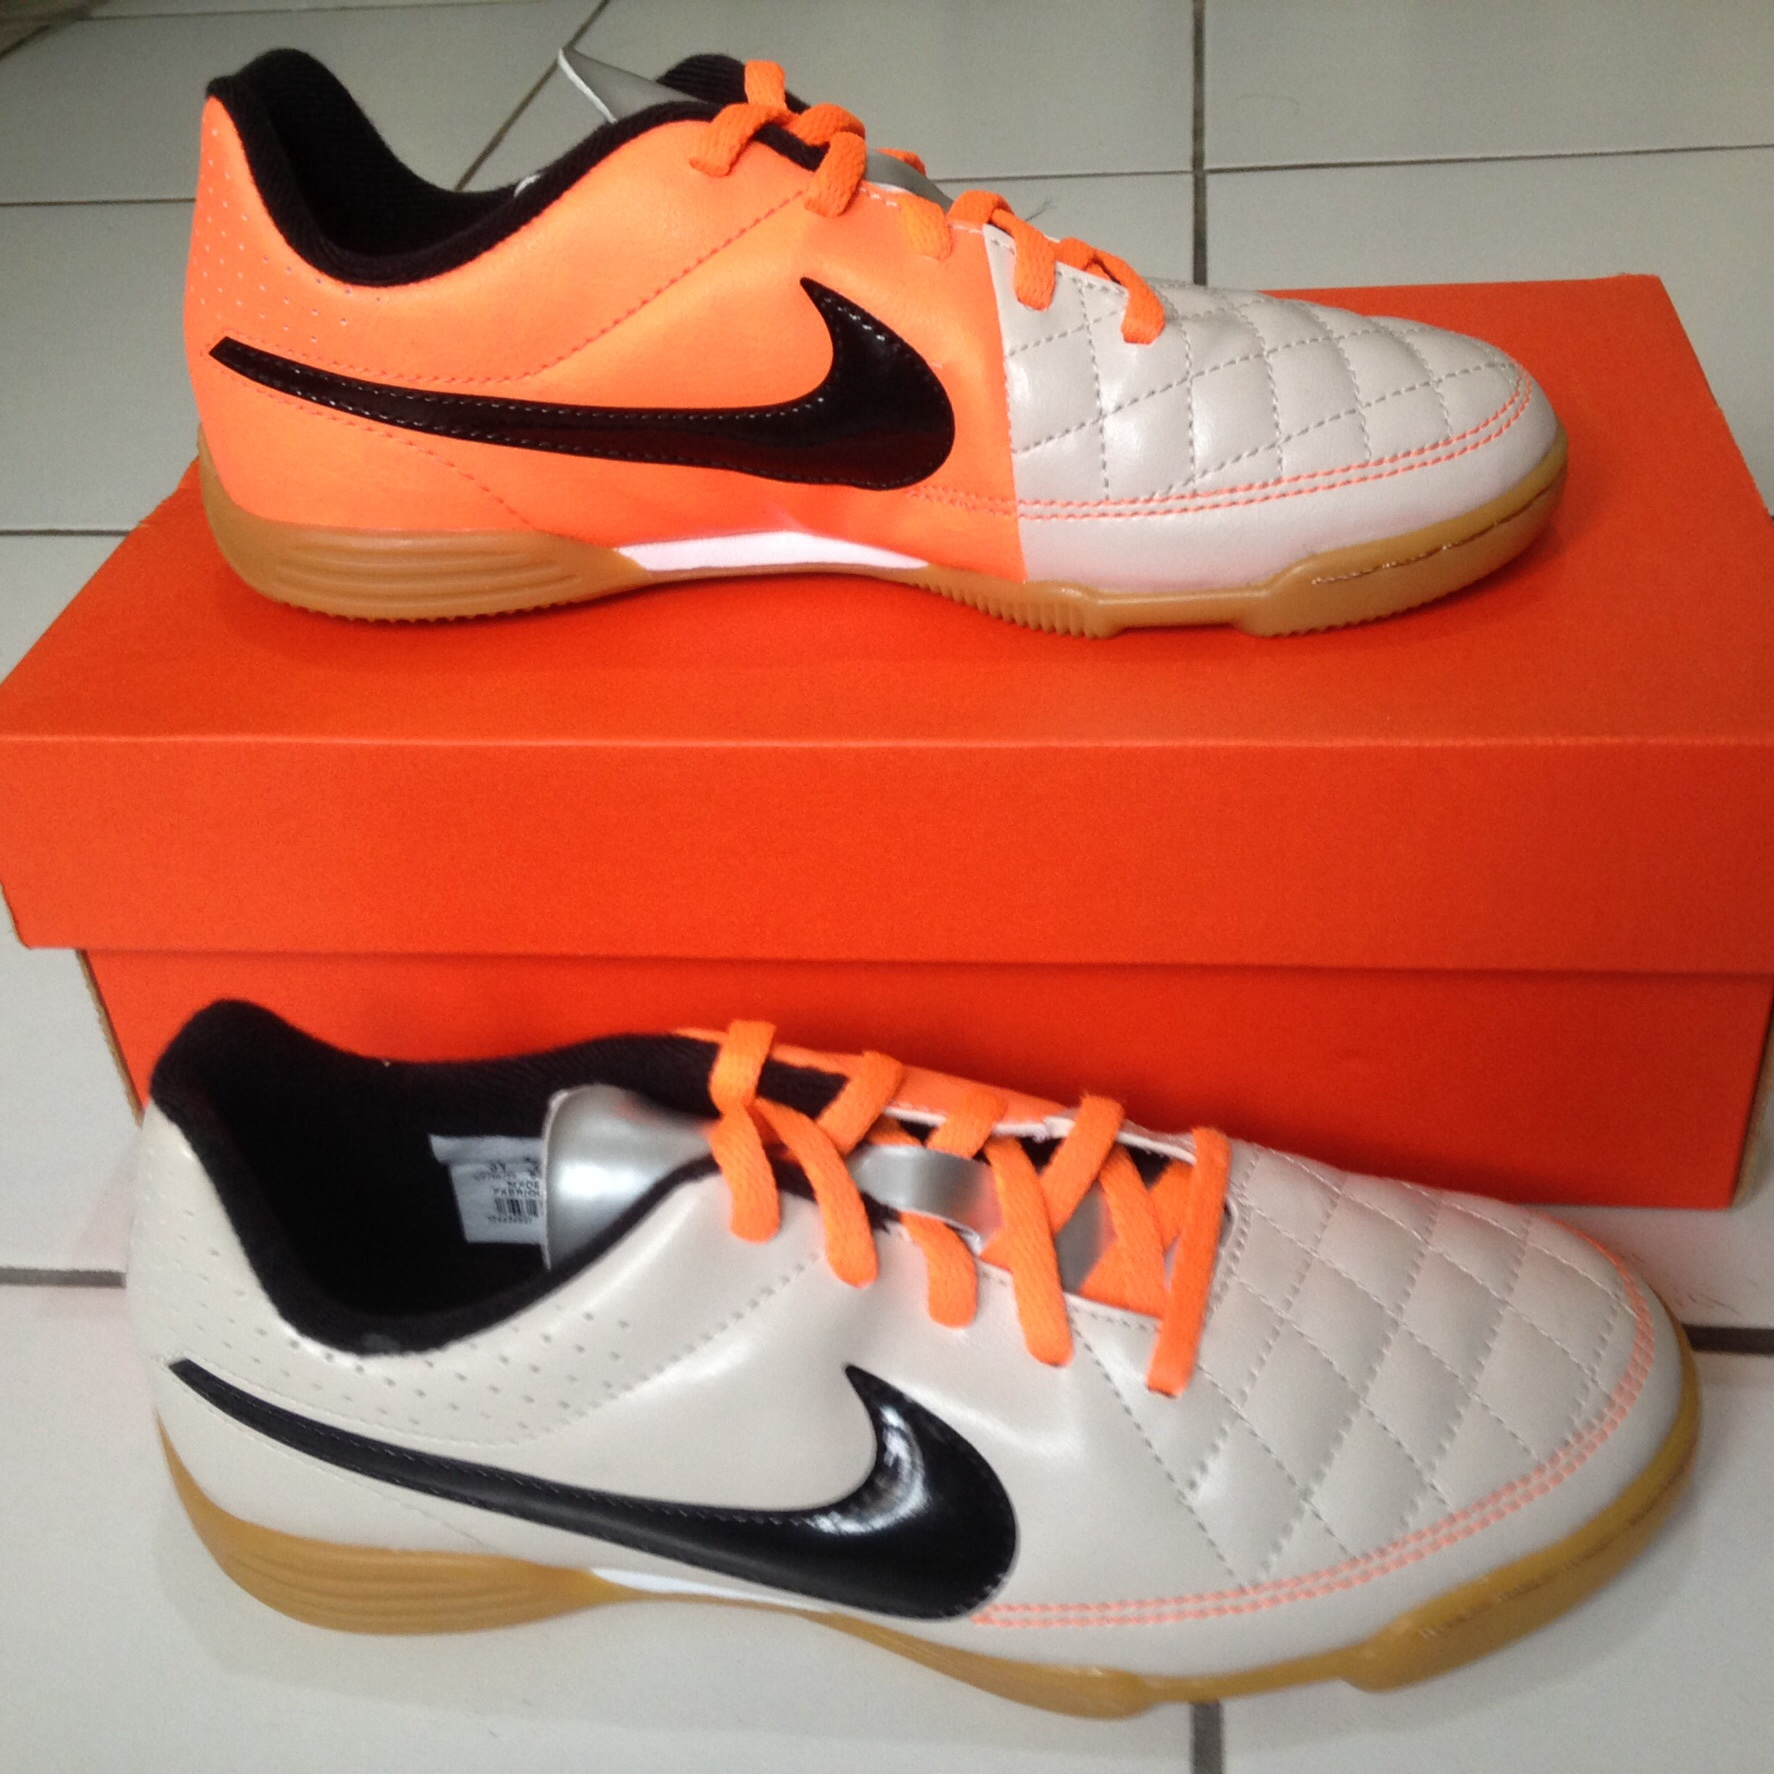 Jual Nike JR Tiempo Rio II IC Size 355 Sepatu Futsal Anak